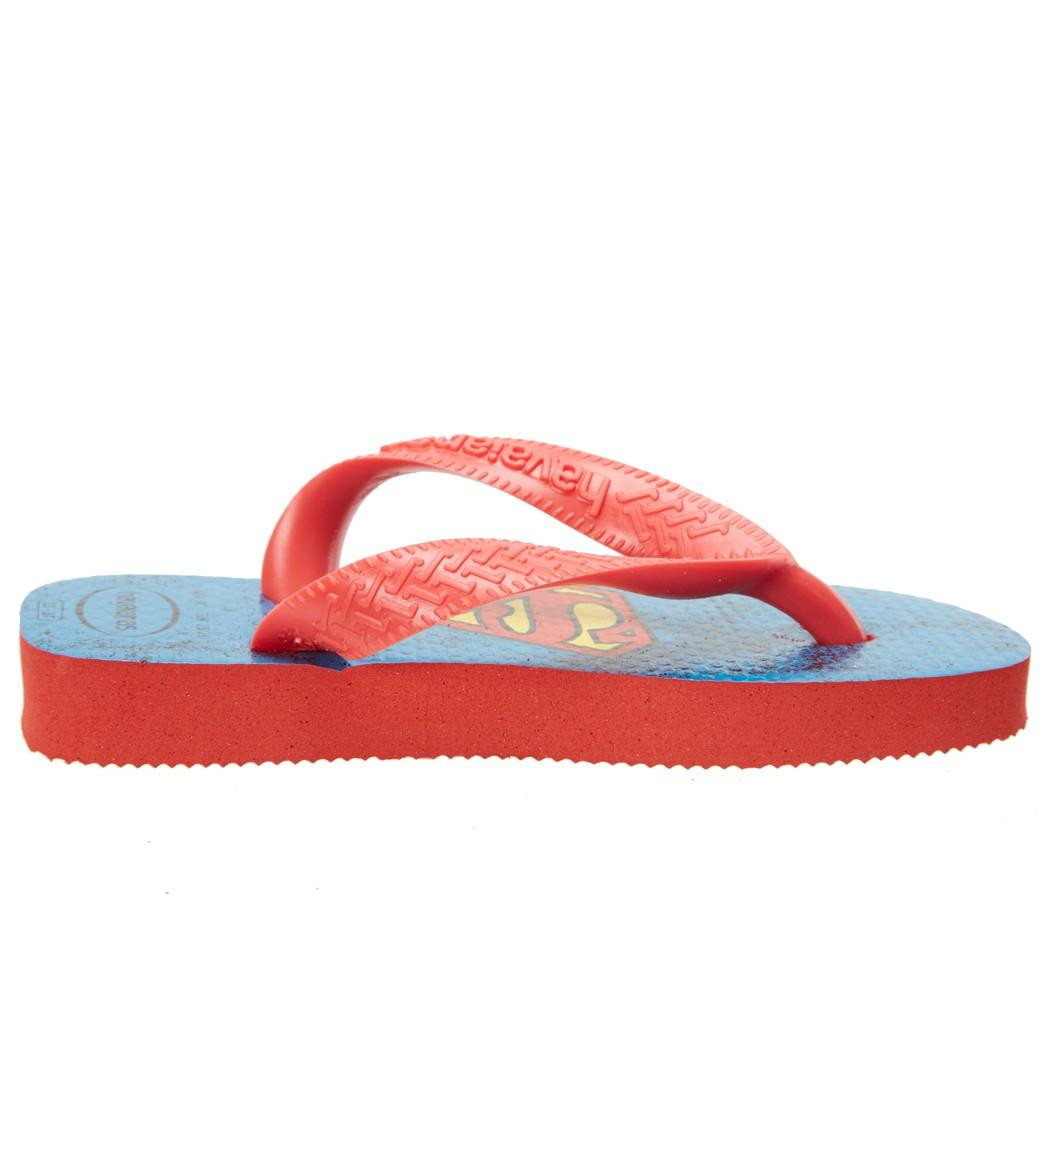 da37e97909325e Havaianas Boys  Heroes DC Flip Flop (Toddler